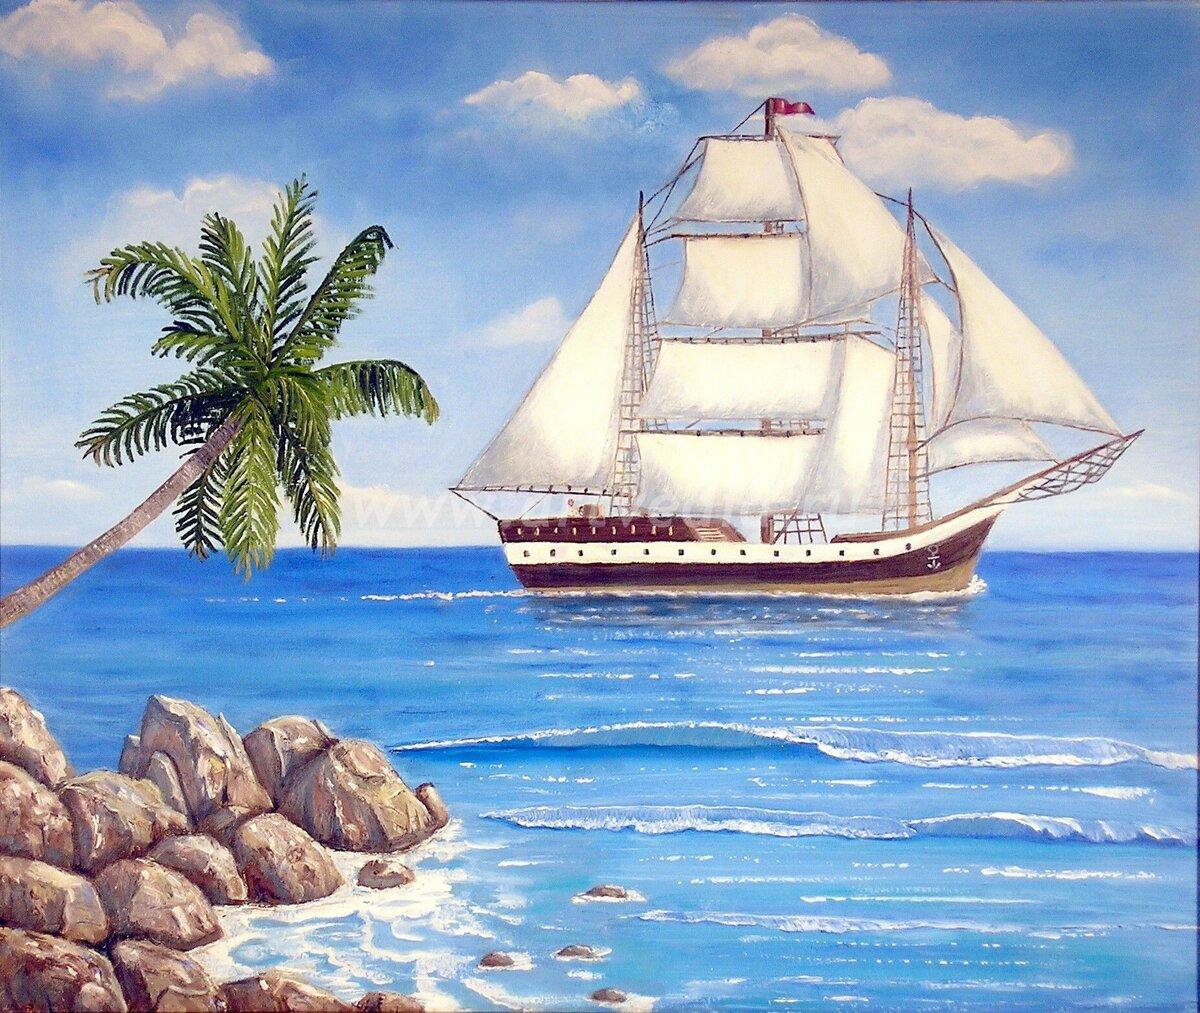 картинки на морскую тематику с кораблем заказа необходима фотография